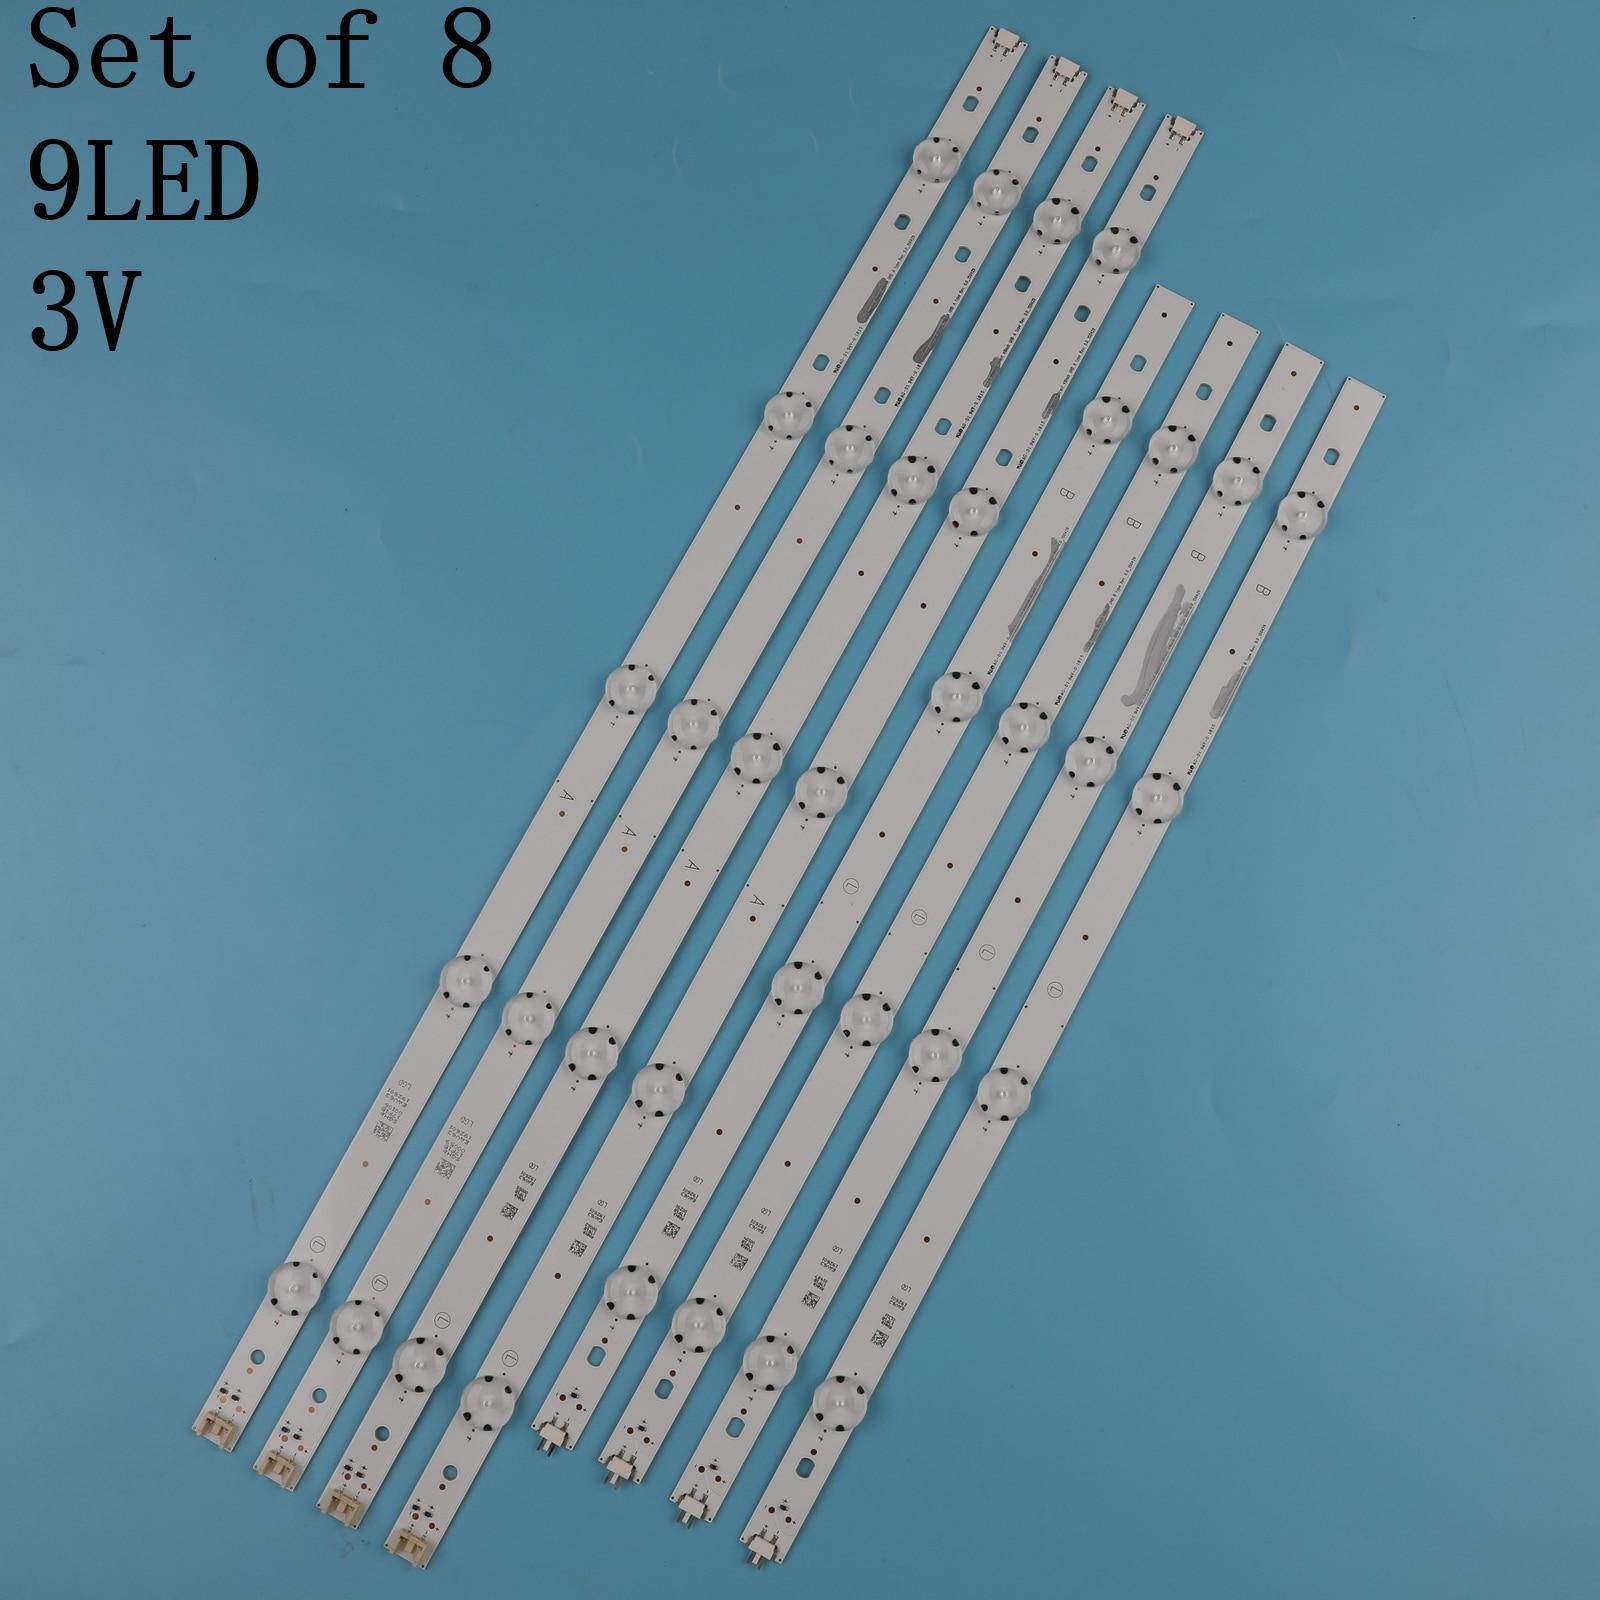 New 8 PCS LED backlight strip for LG 49UH610A 49UH6100 49lf5100 49UH6030 49UF640V 49UF6407 LGE_WICOP_49inch_UHD/FHD_REV05_A B